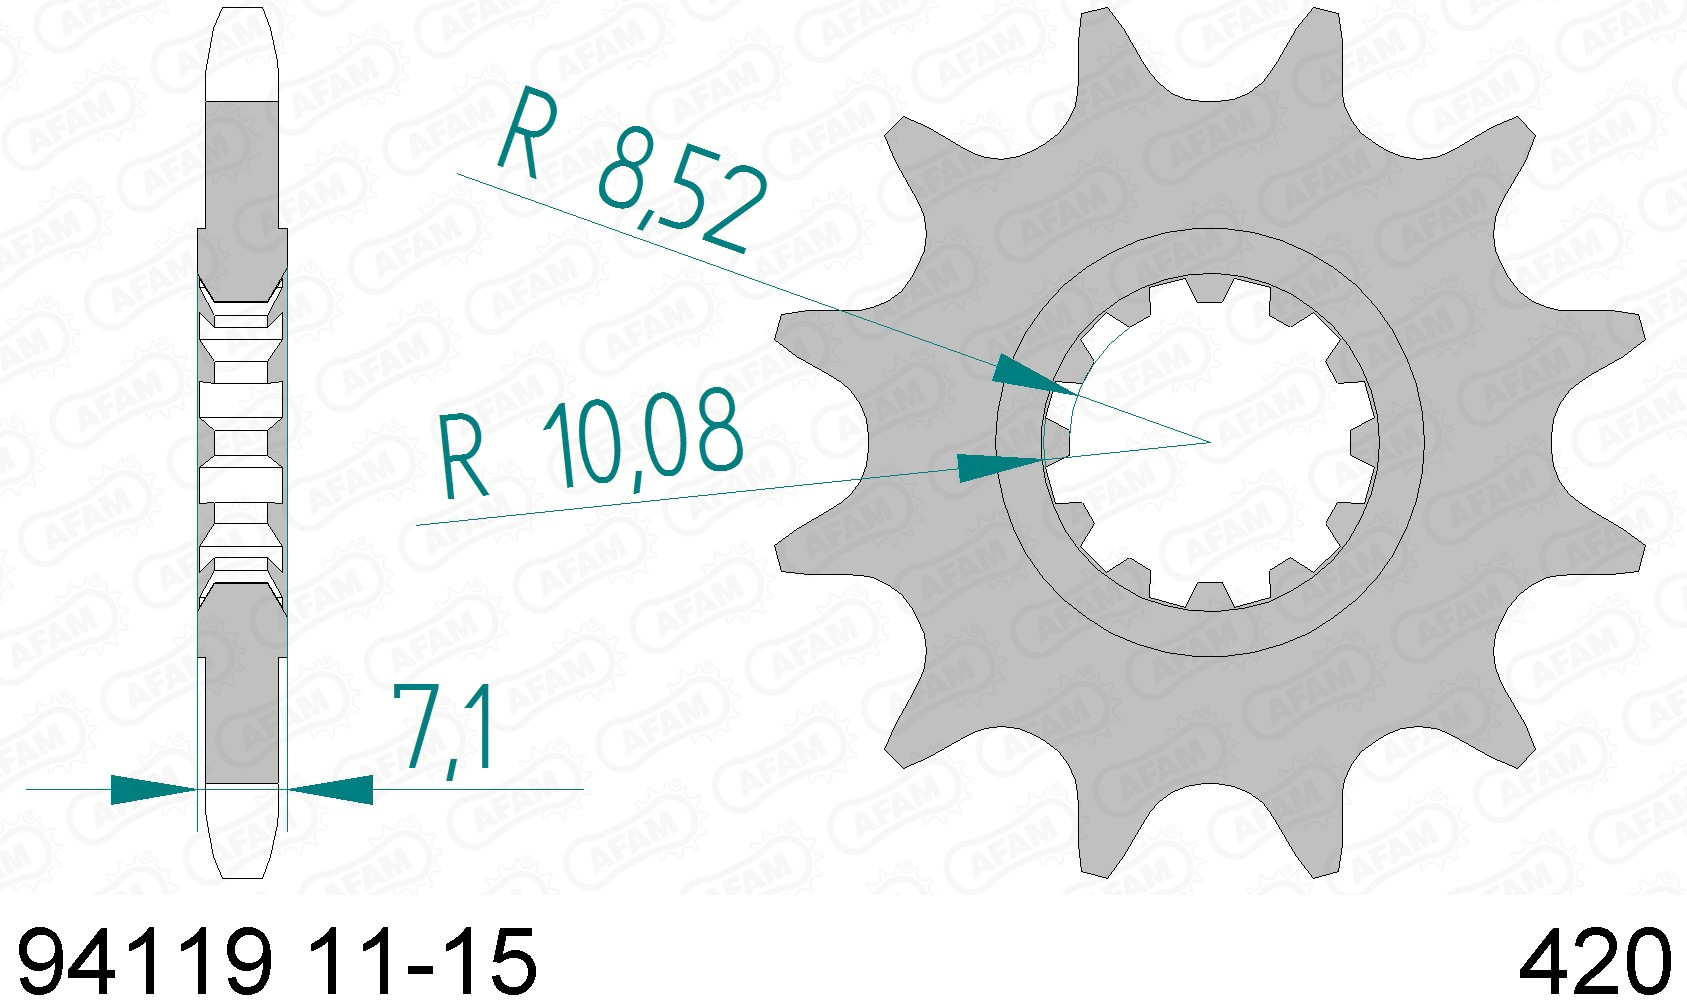 Kit lant Rieju 50 RS2 Matrix 2003-0